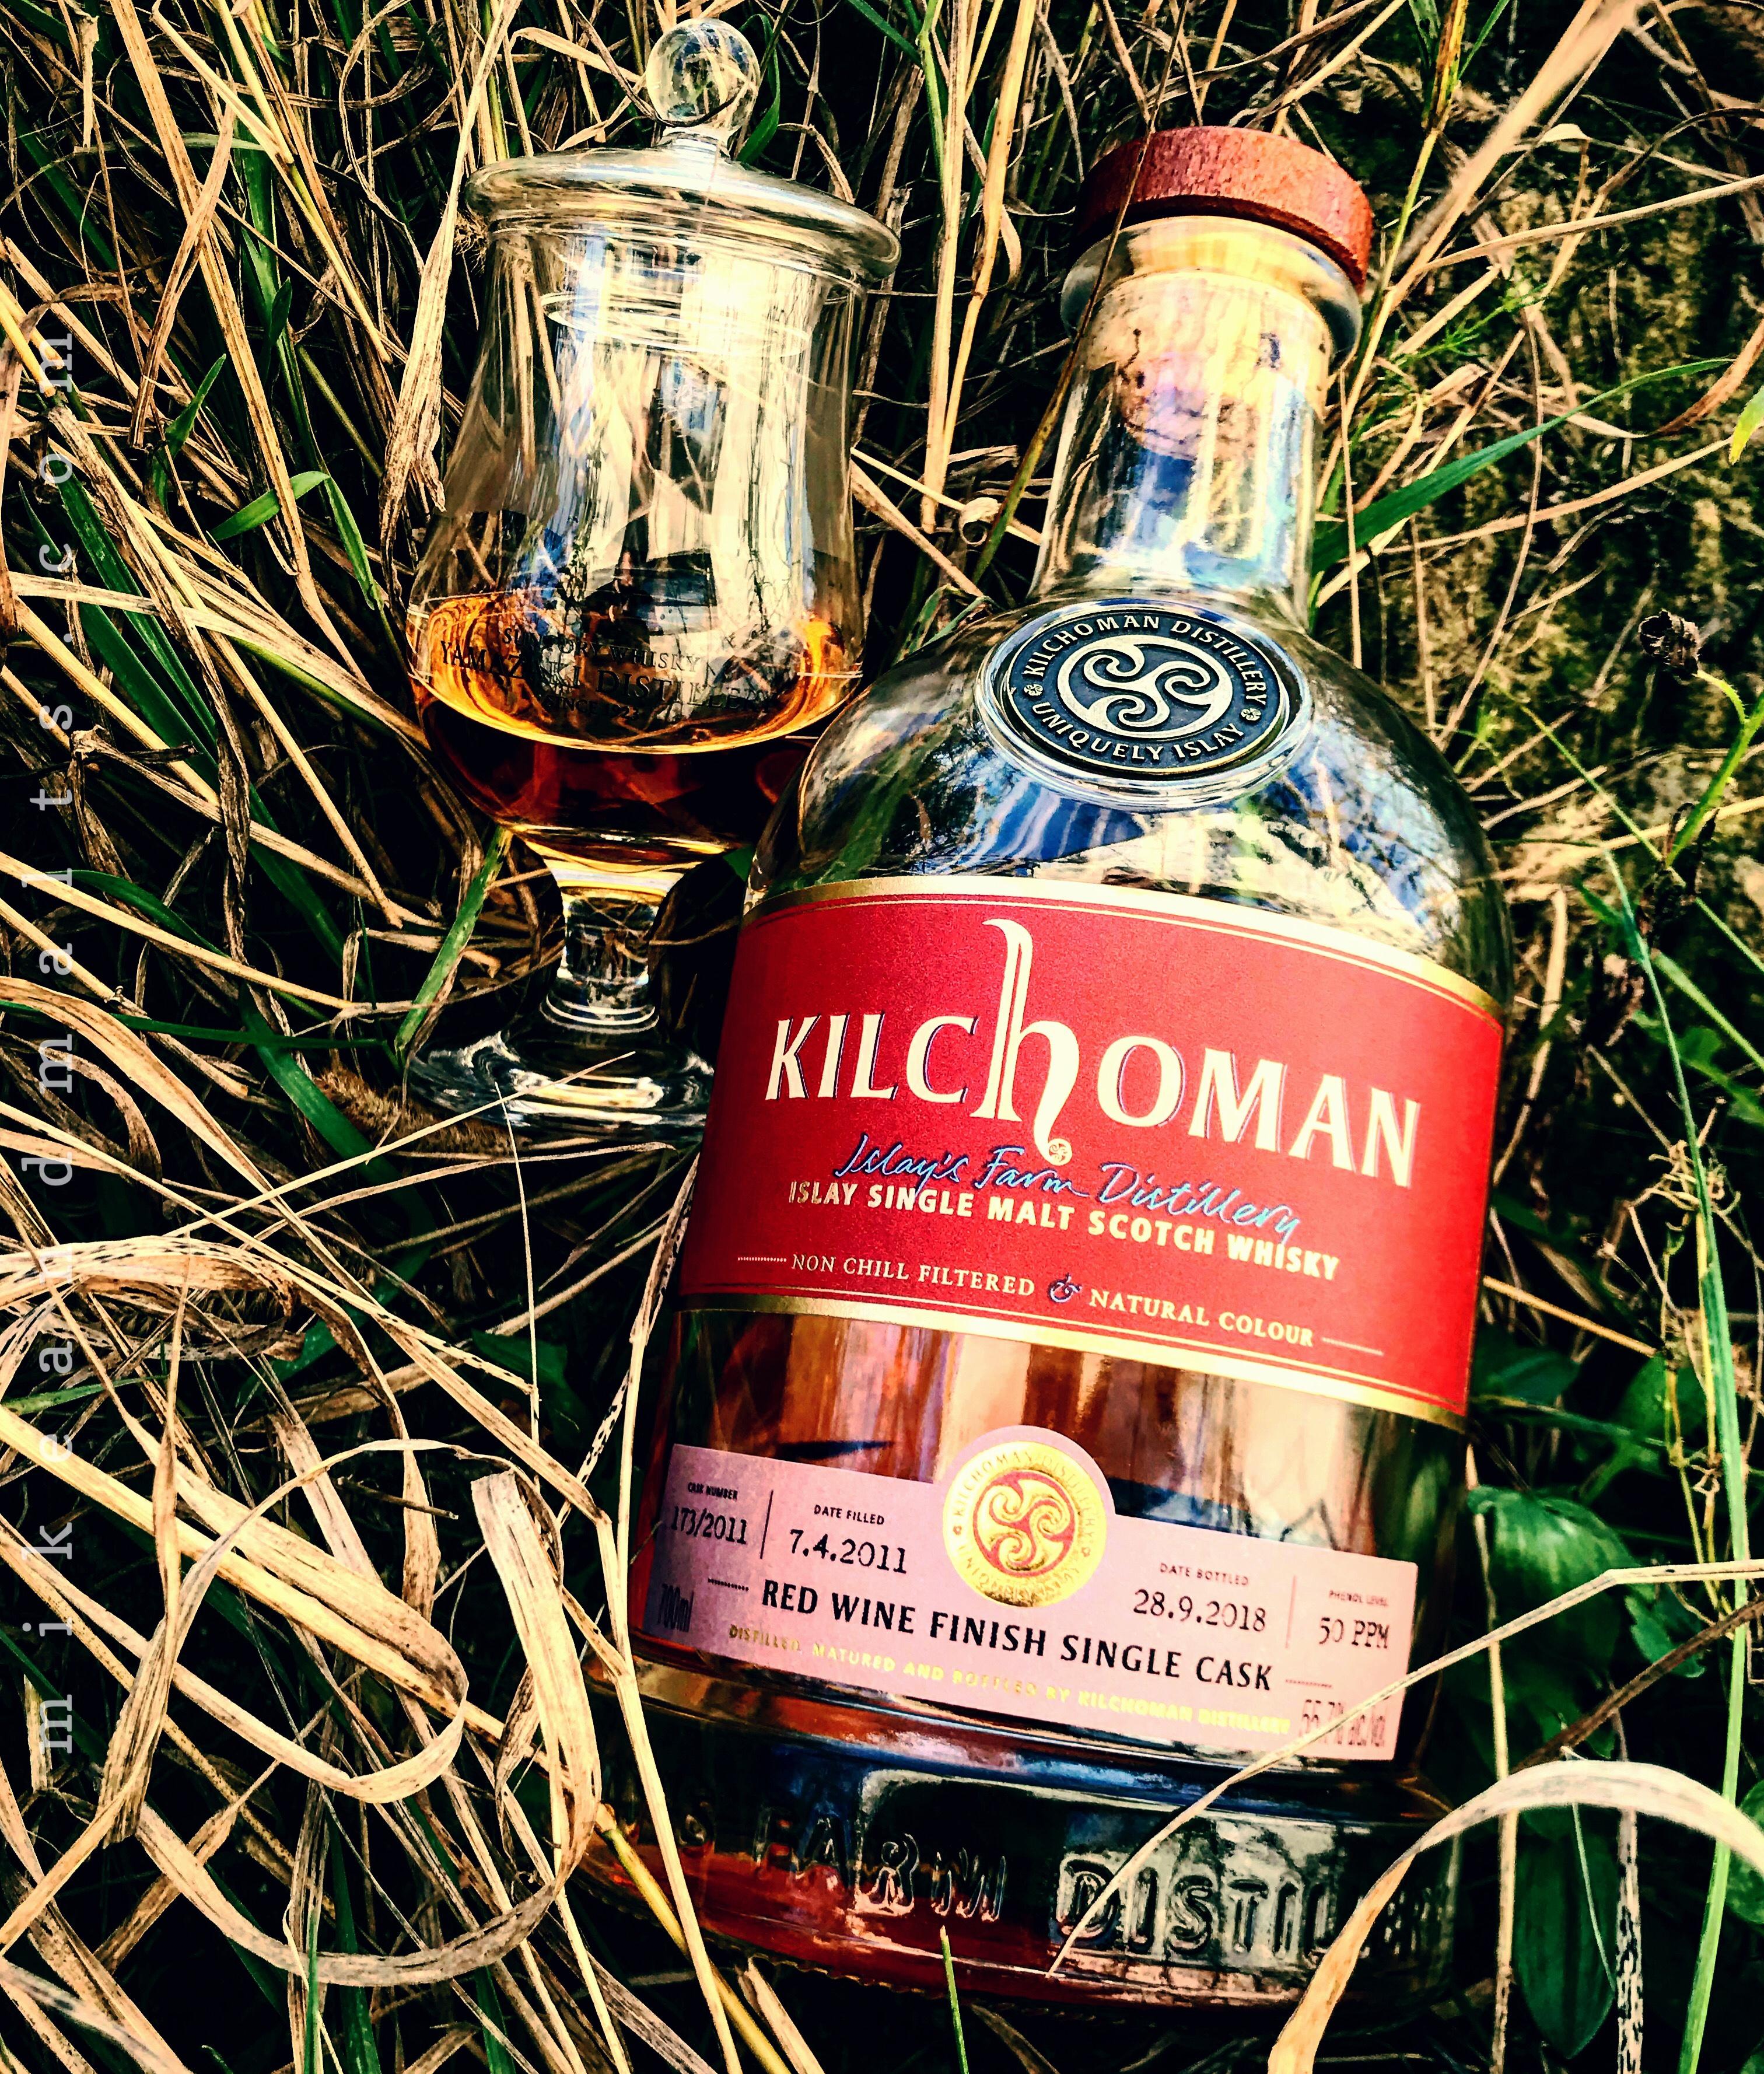 Kilchoman Red Wine